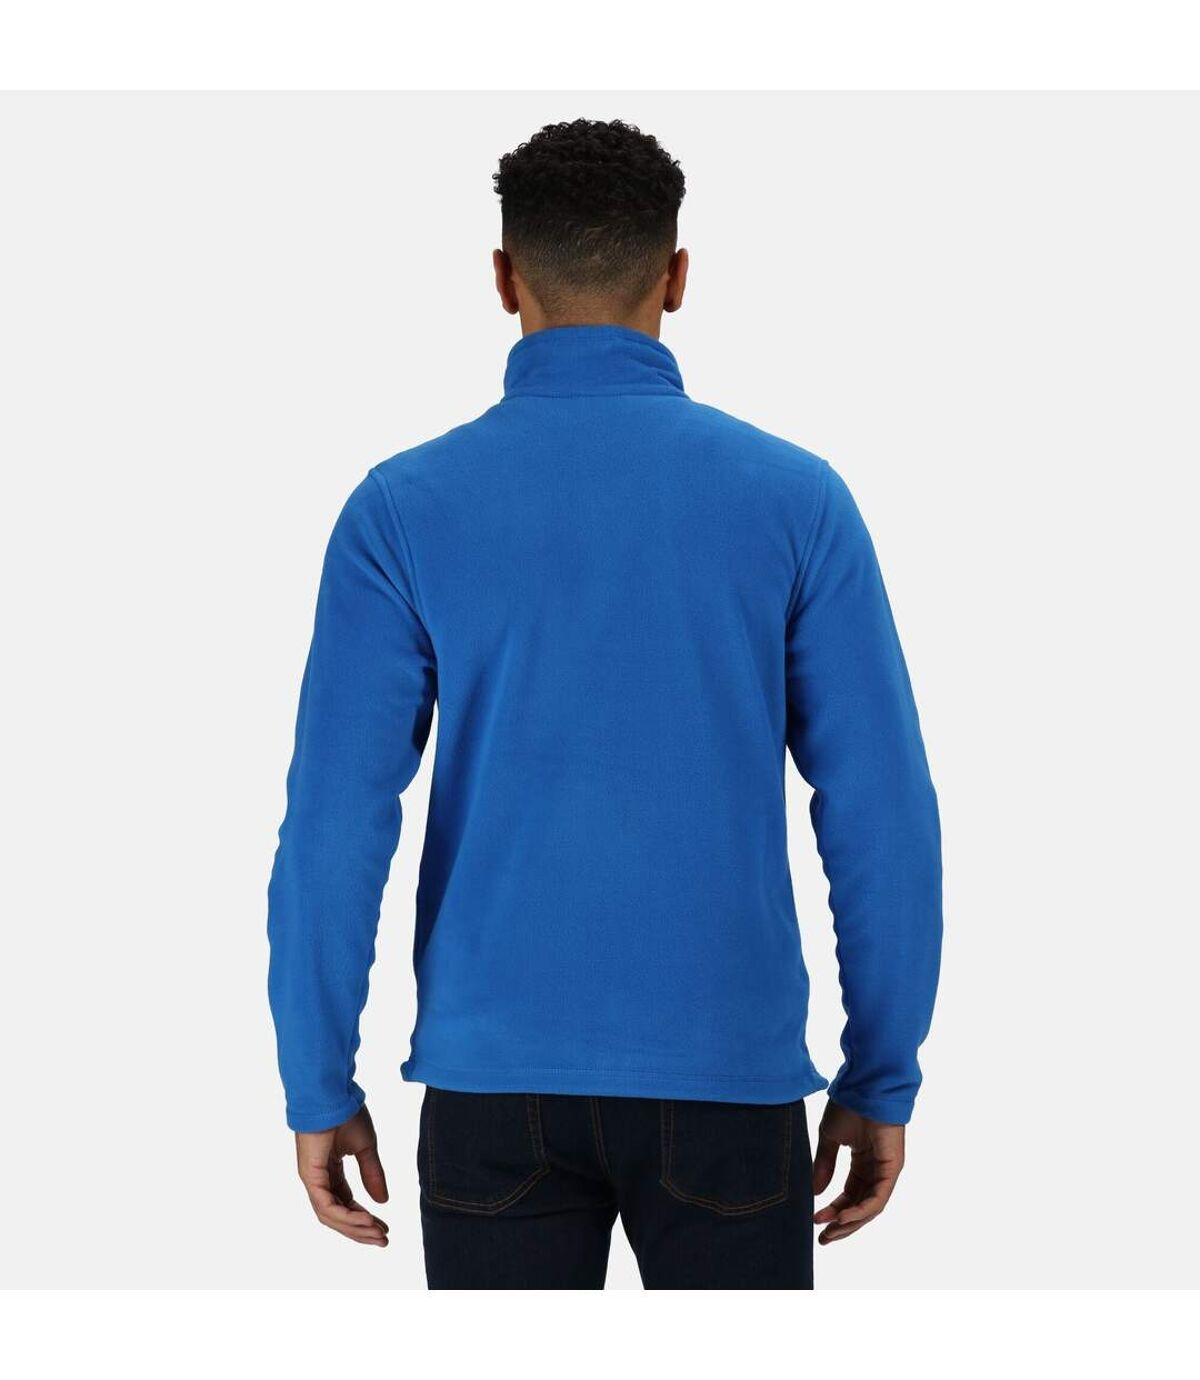 Regatta - Veste polaire - Homme (Bleu) - UTRG1551